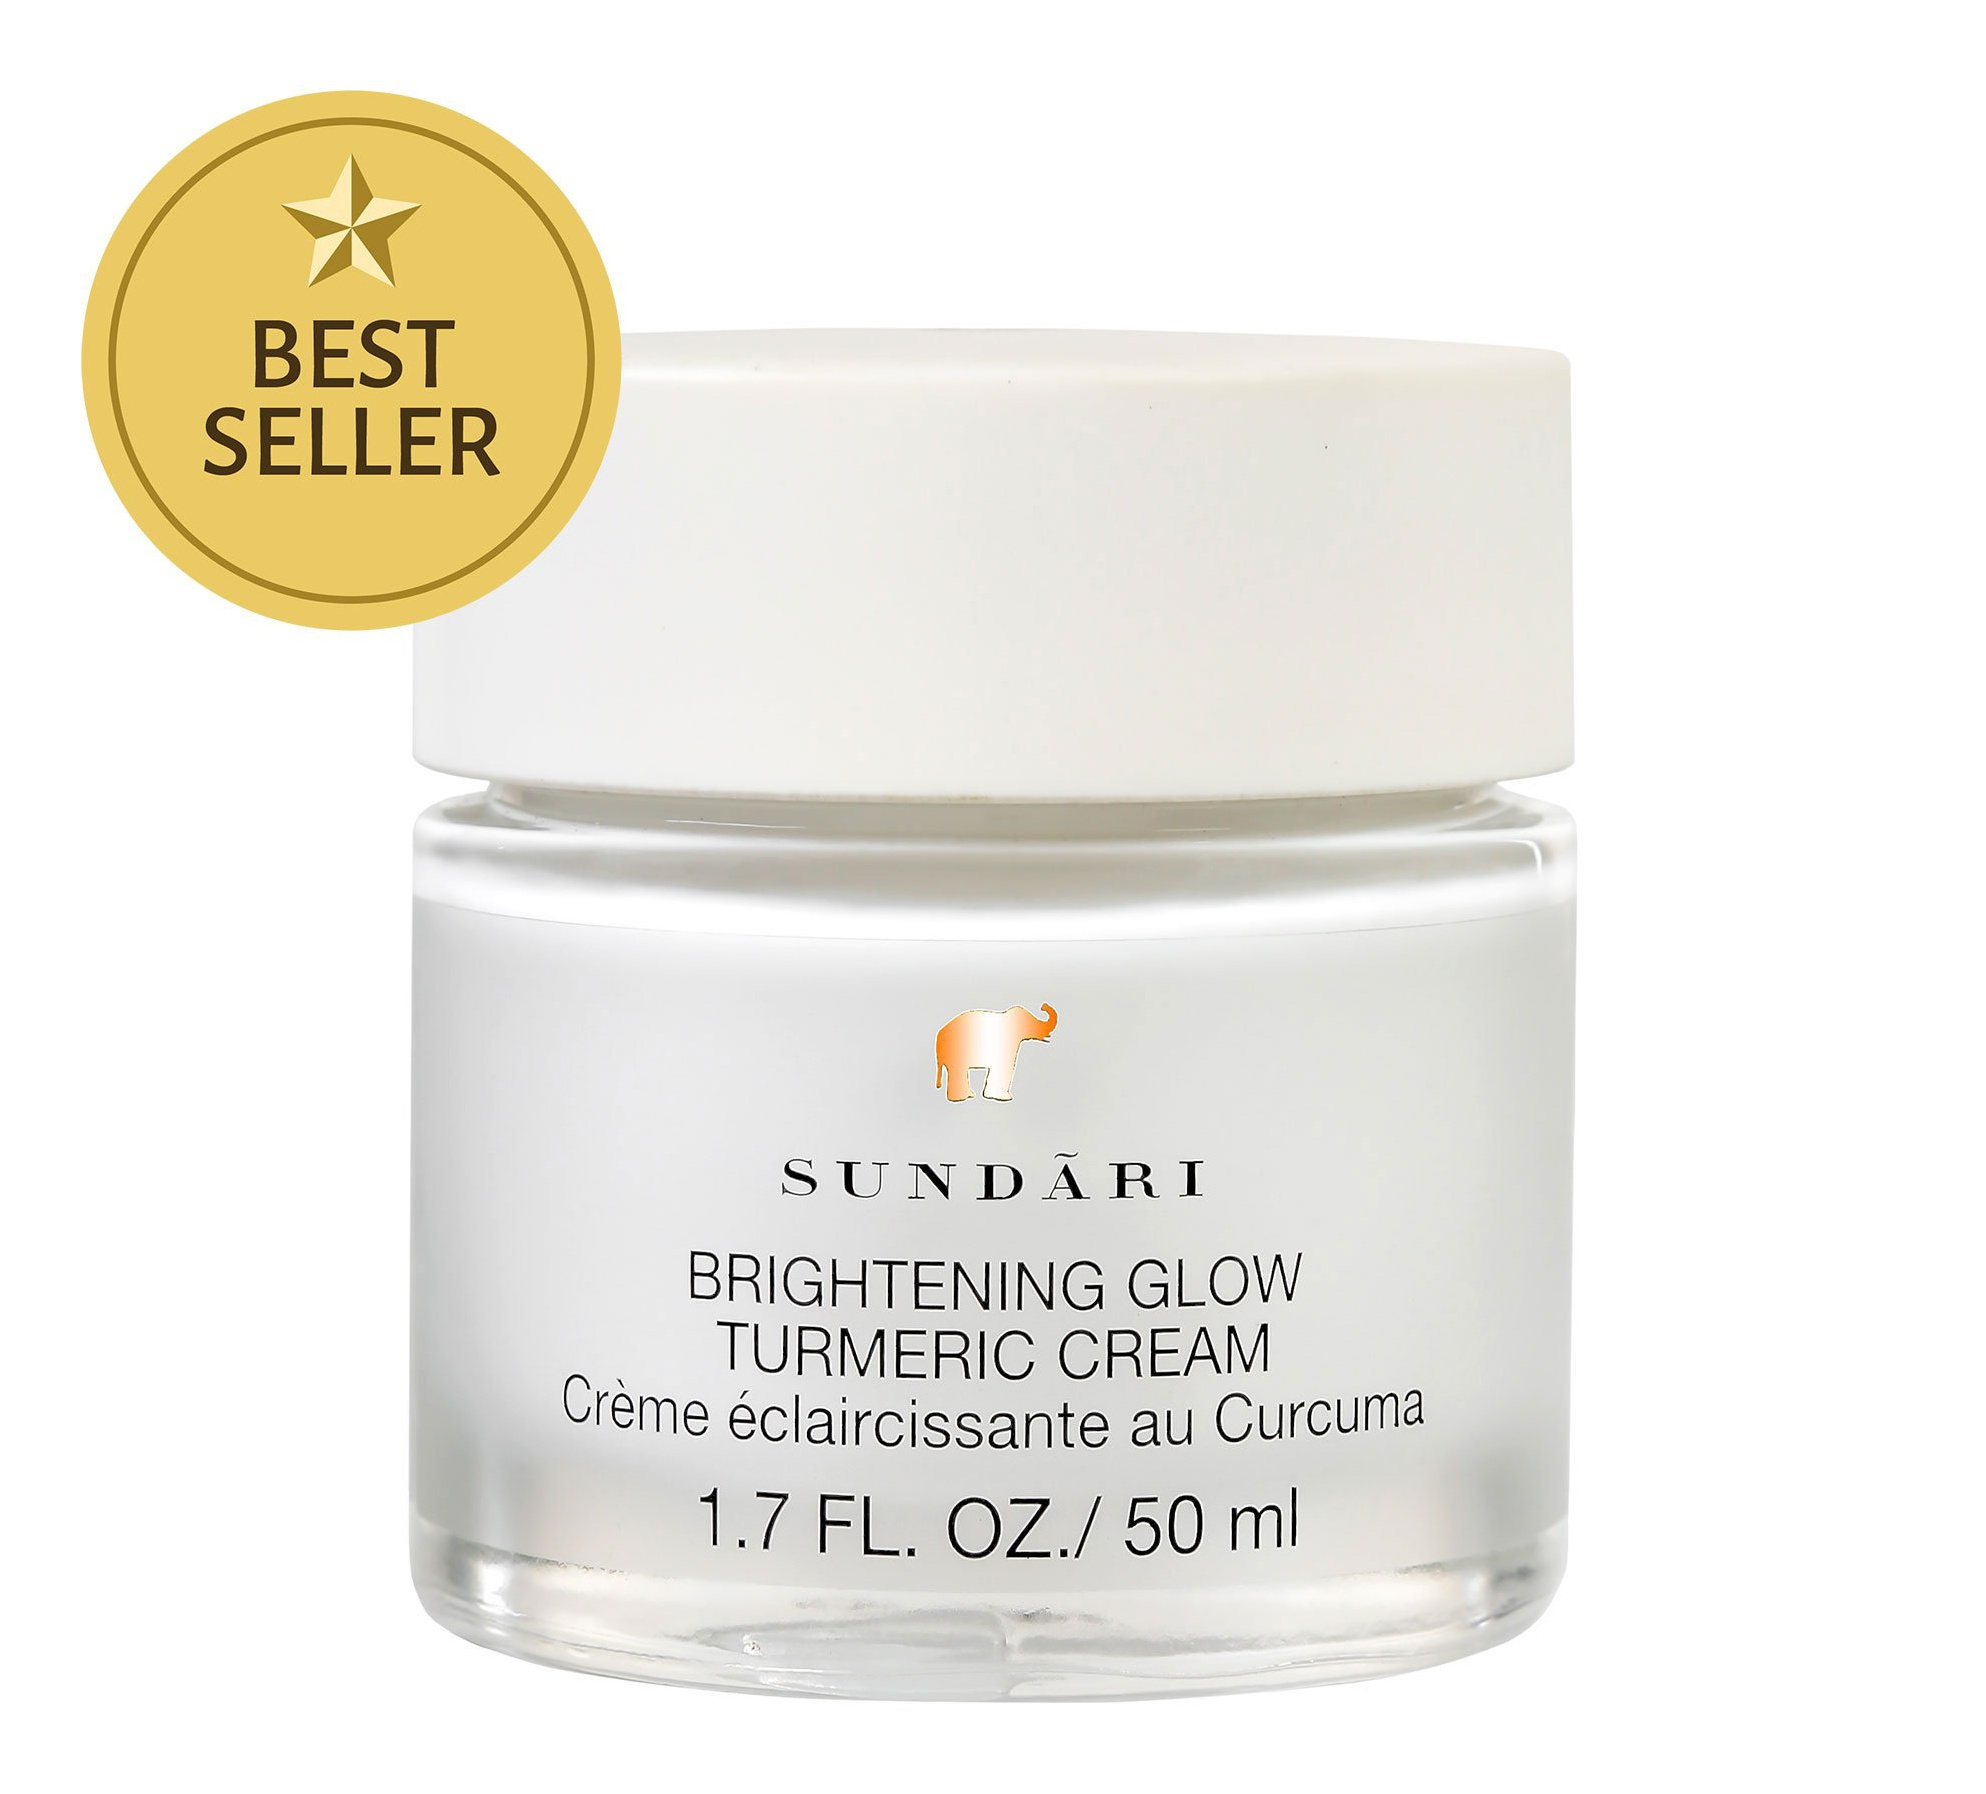 SUNDARI Brightening Glow Turmeric Cream